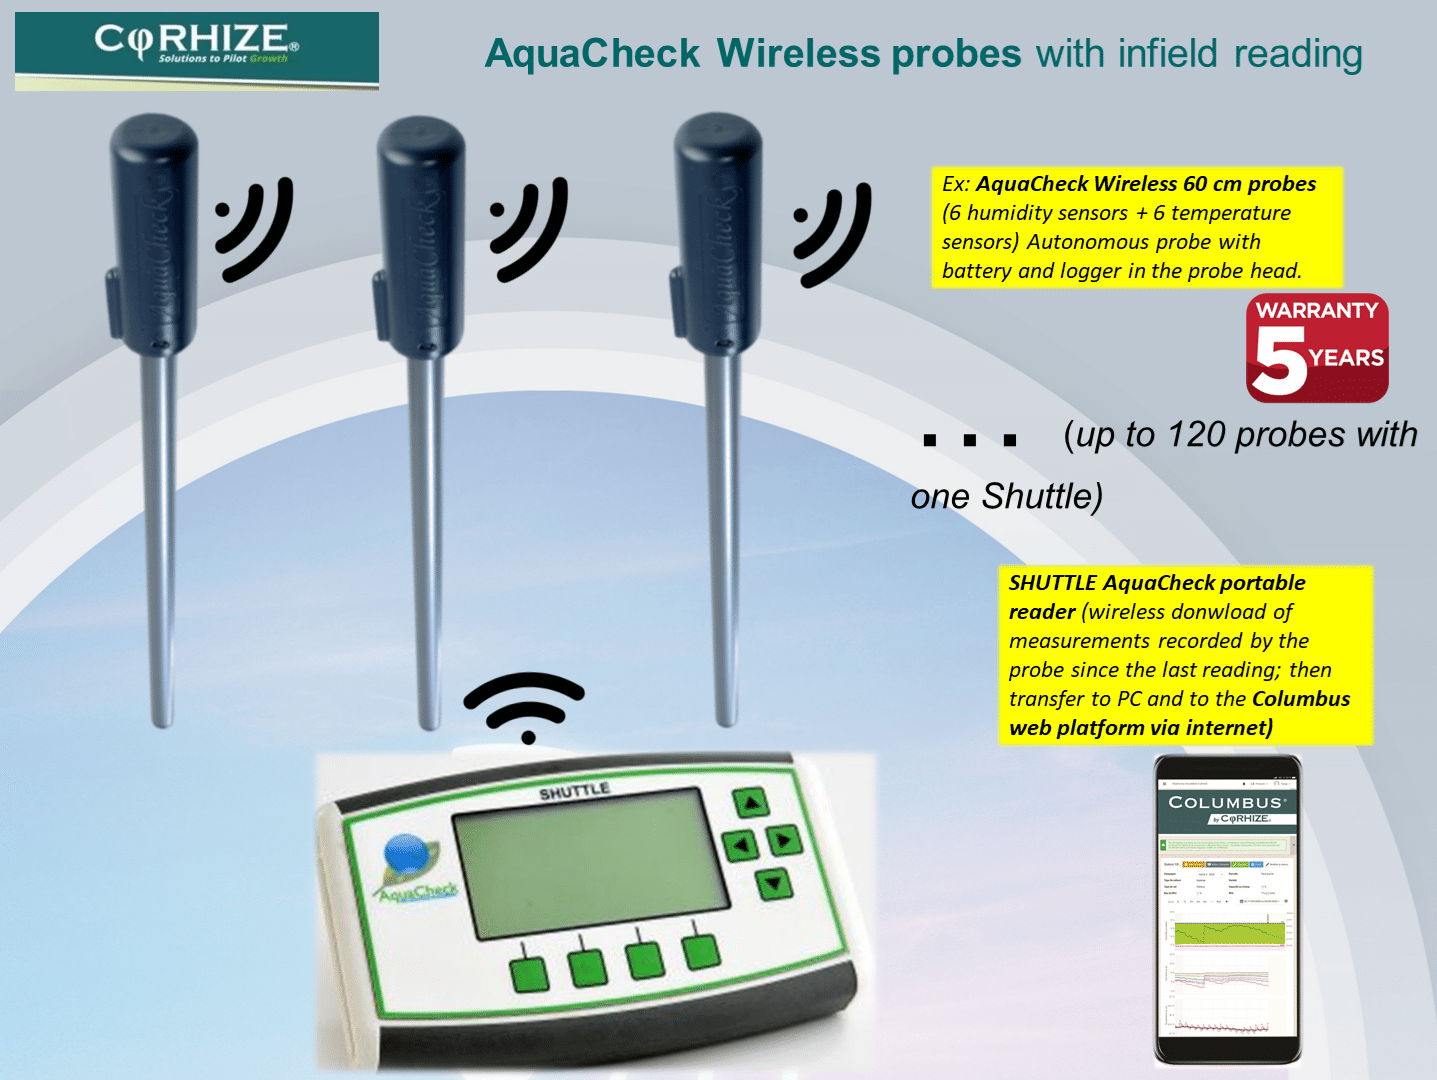 Pour Site Internet Corhize 2020 Kit Aquacheck Wireless 5 Ans Anglais